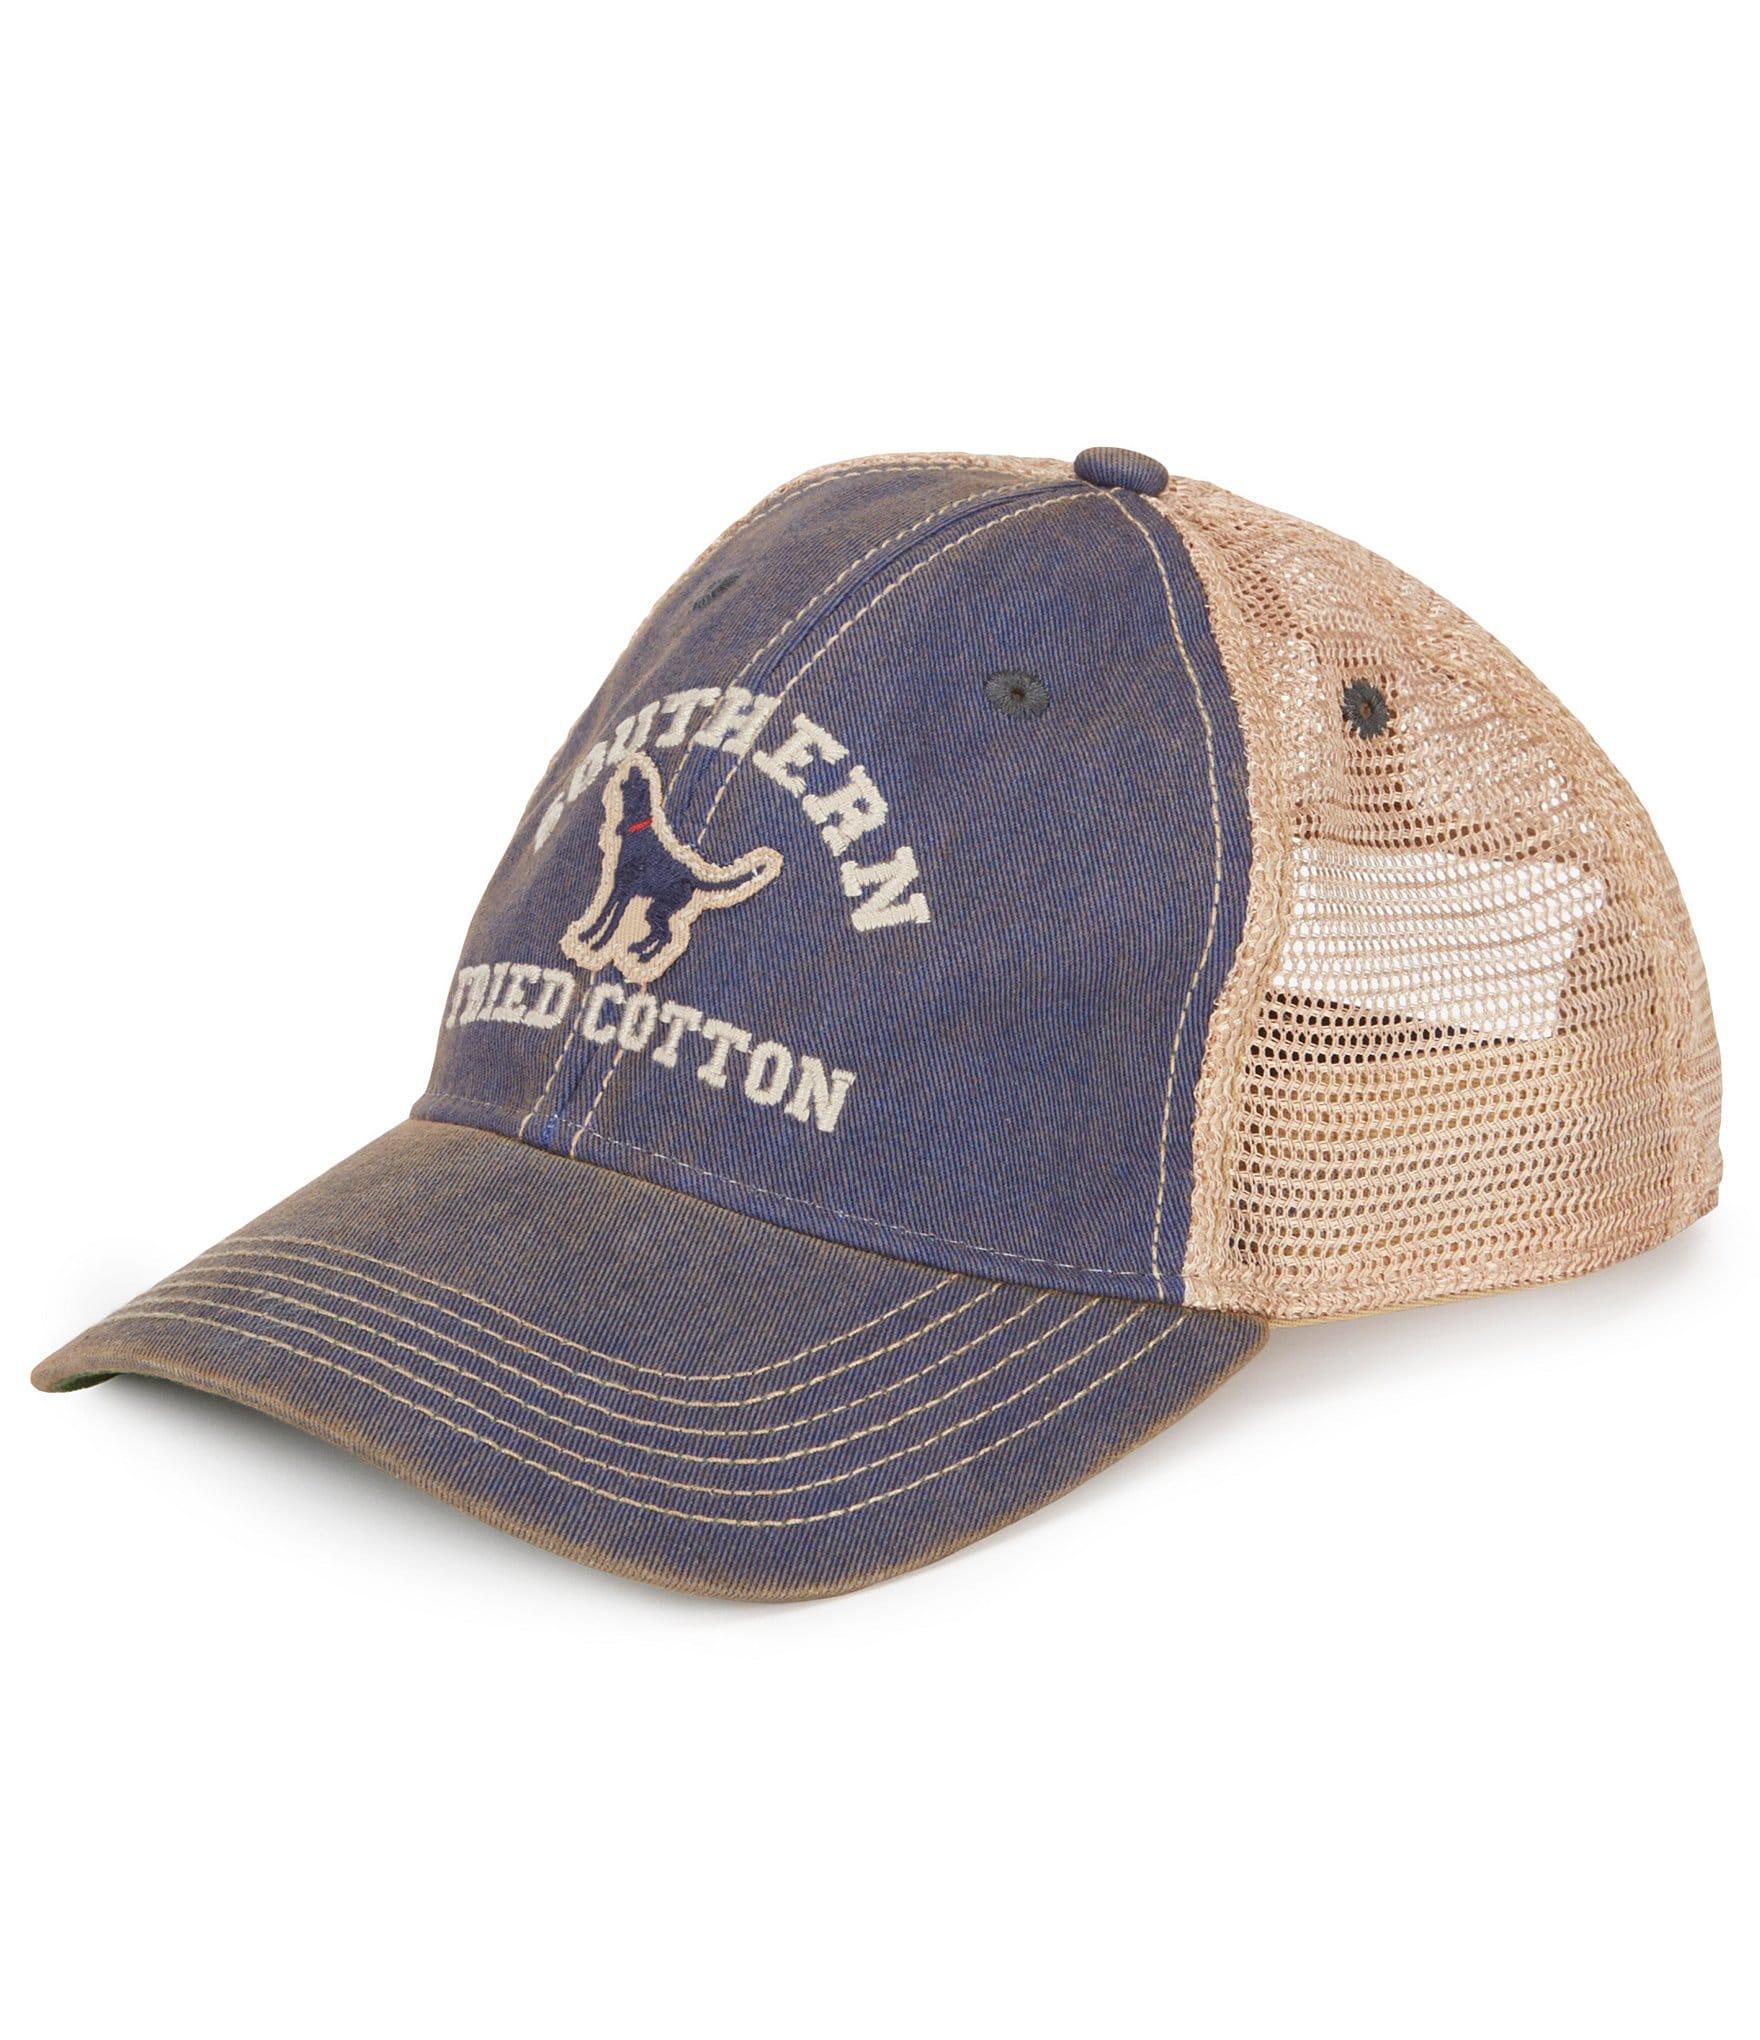 southern fried cotton howler trucker hat dillards